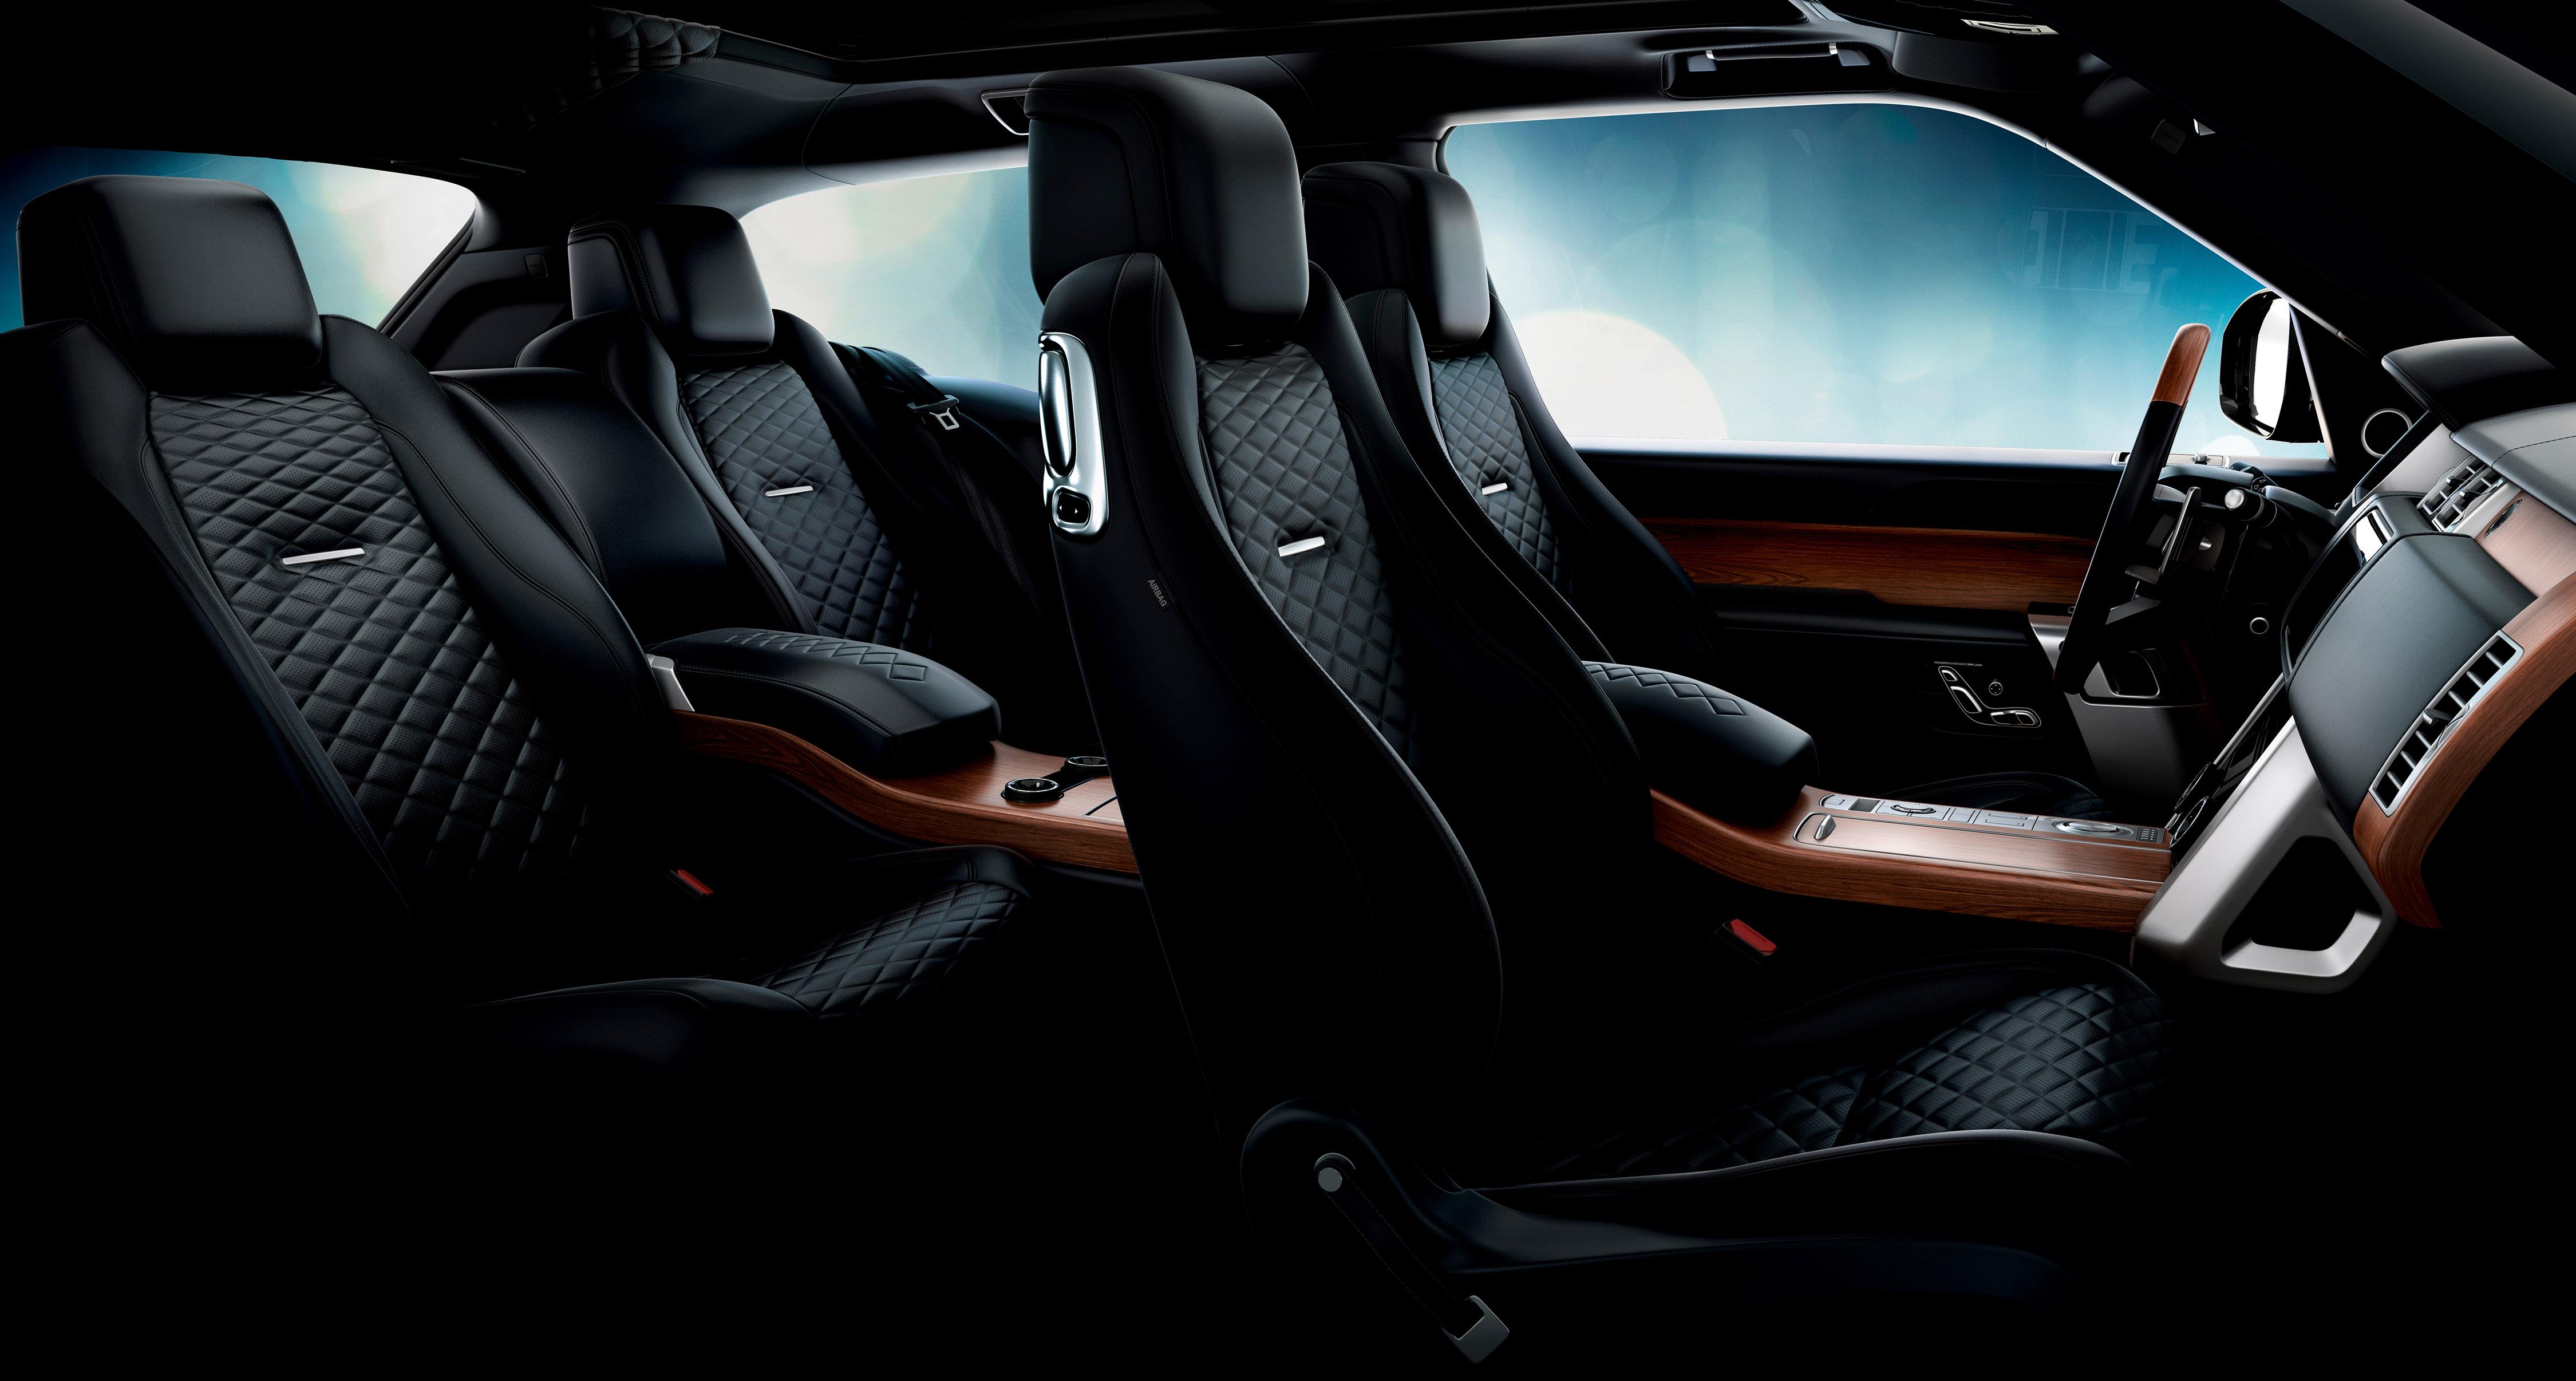 273747 09 range rover sv coupe 50e076 original 1519909260